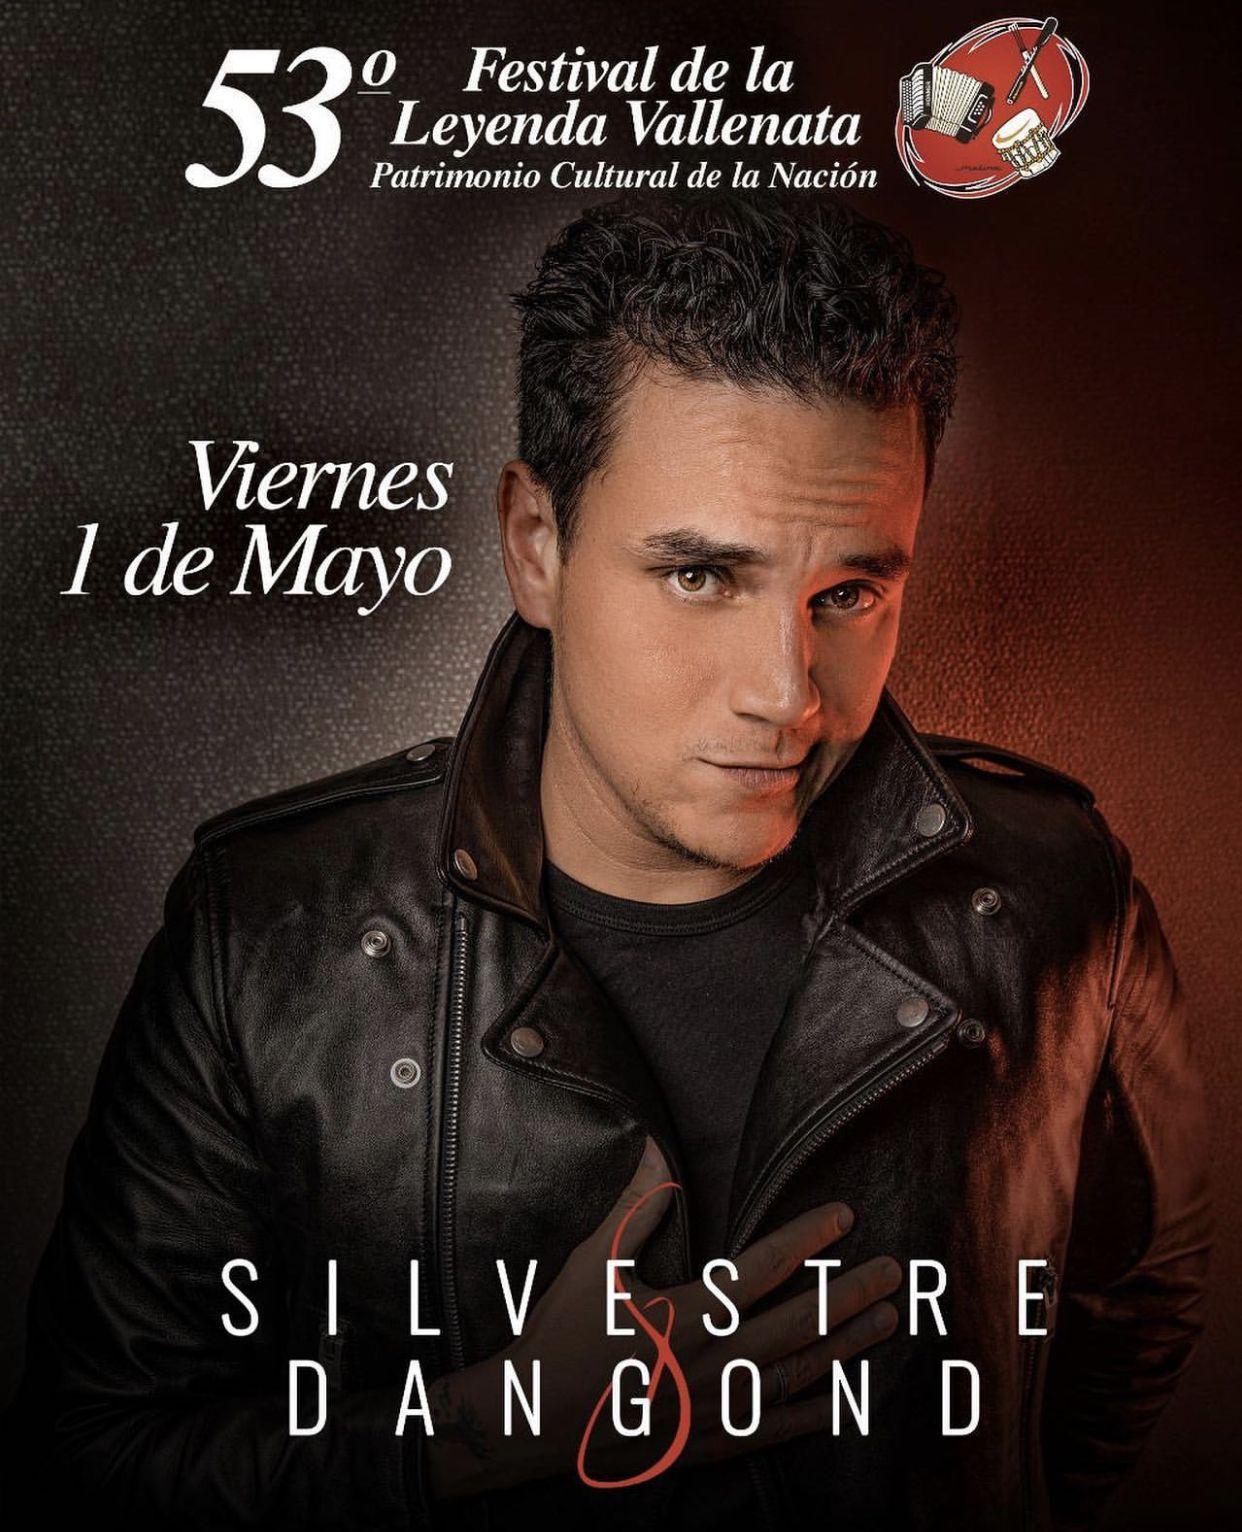 Silvestre Dangond en el Festival Vallenato 2020